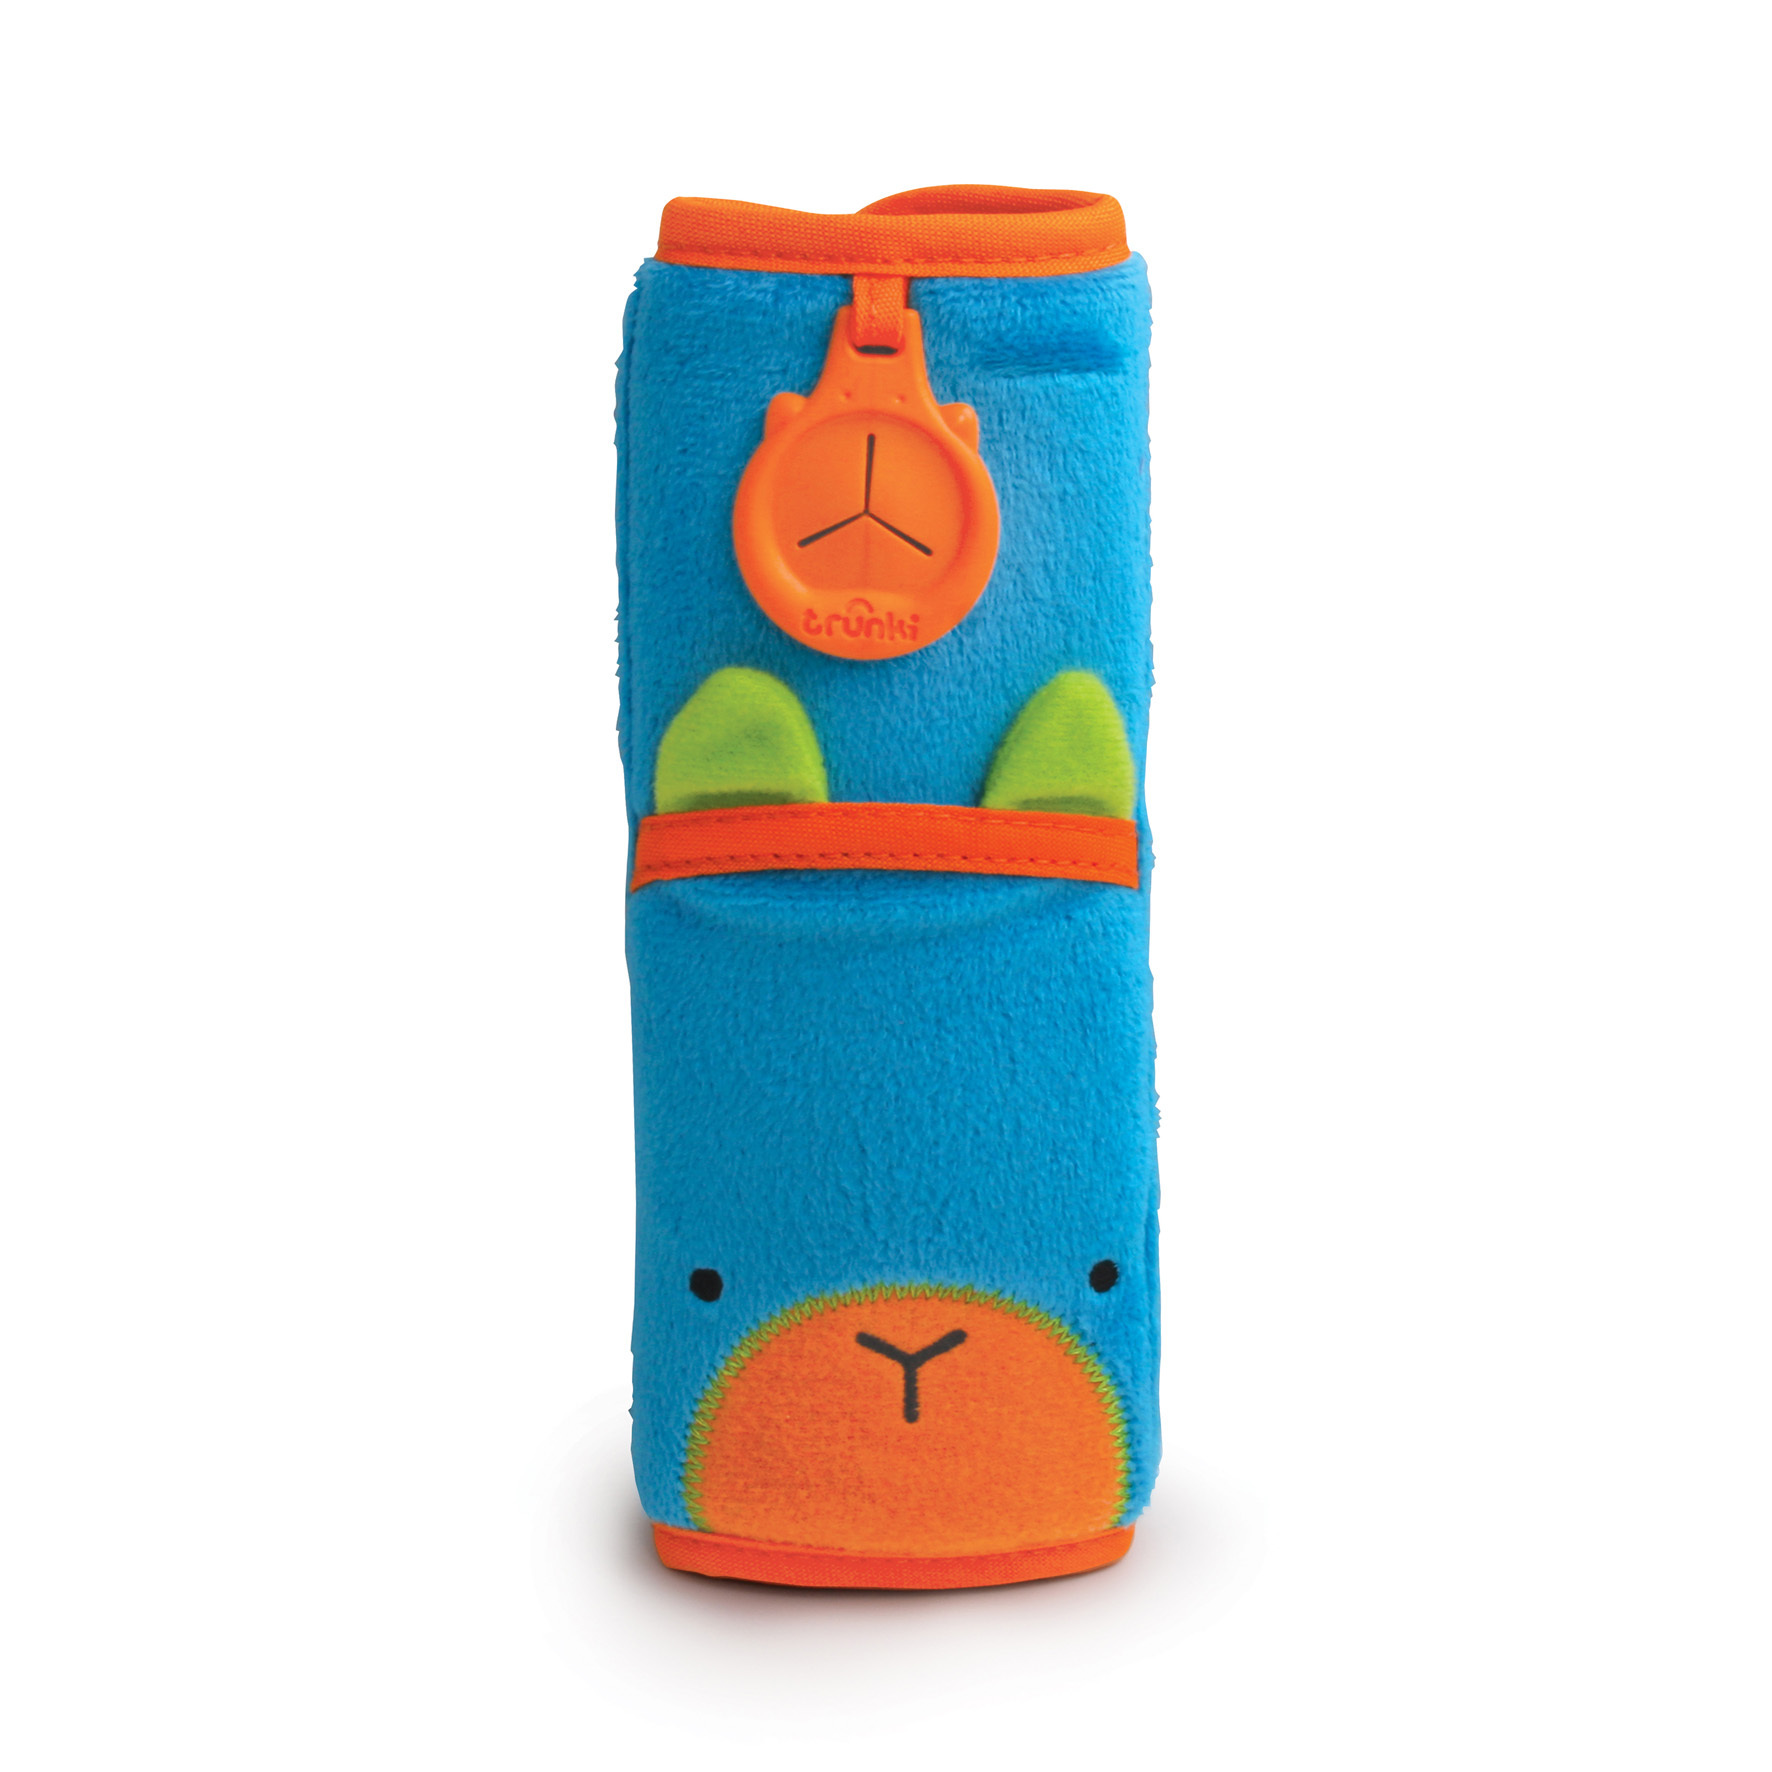 Накладка-чехол для ремня безопасности – Заяц, голубой, Trunki  - купить со скидкой